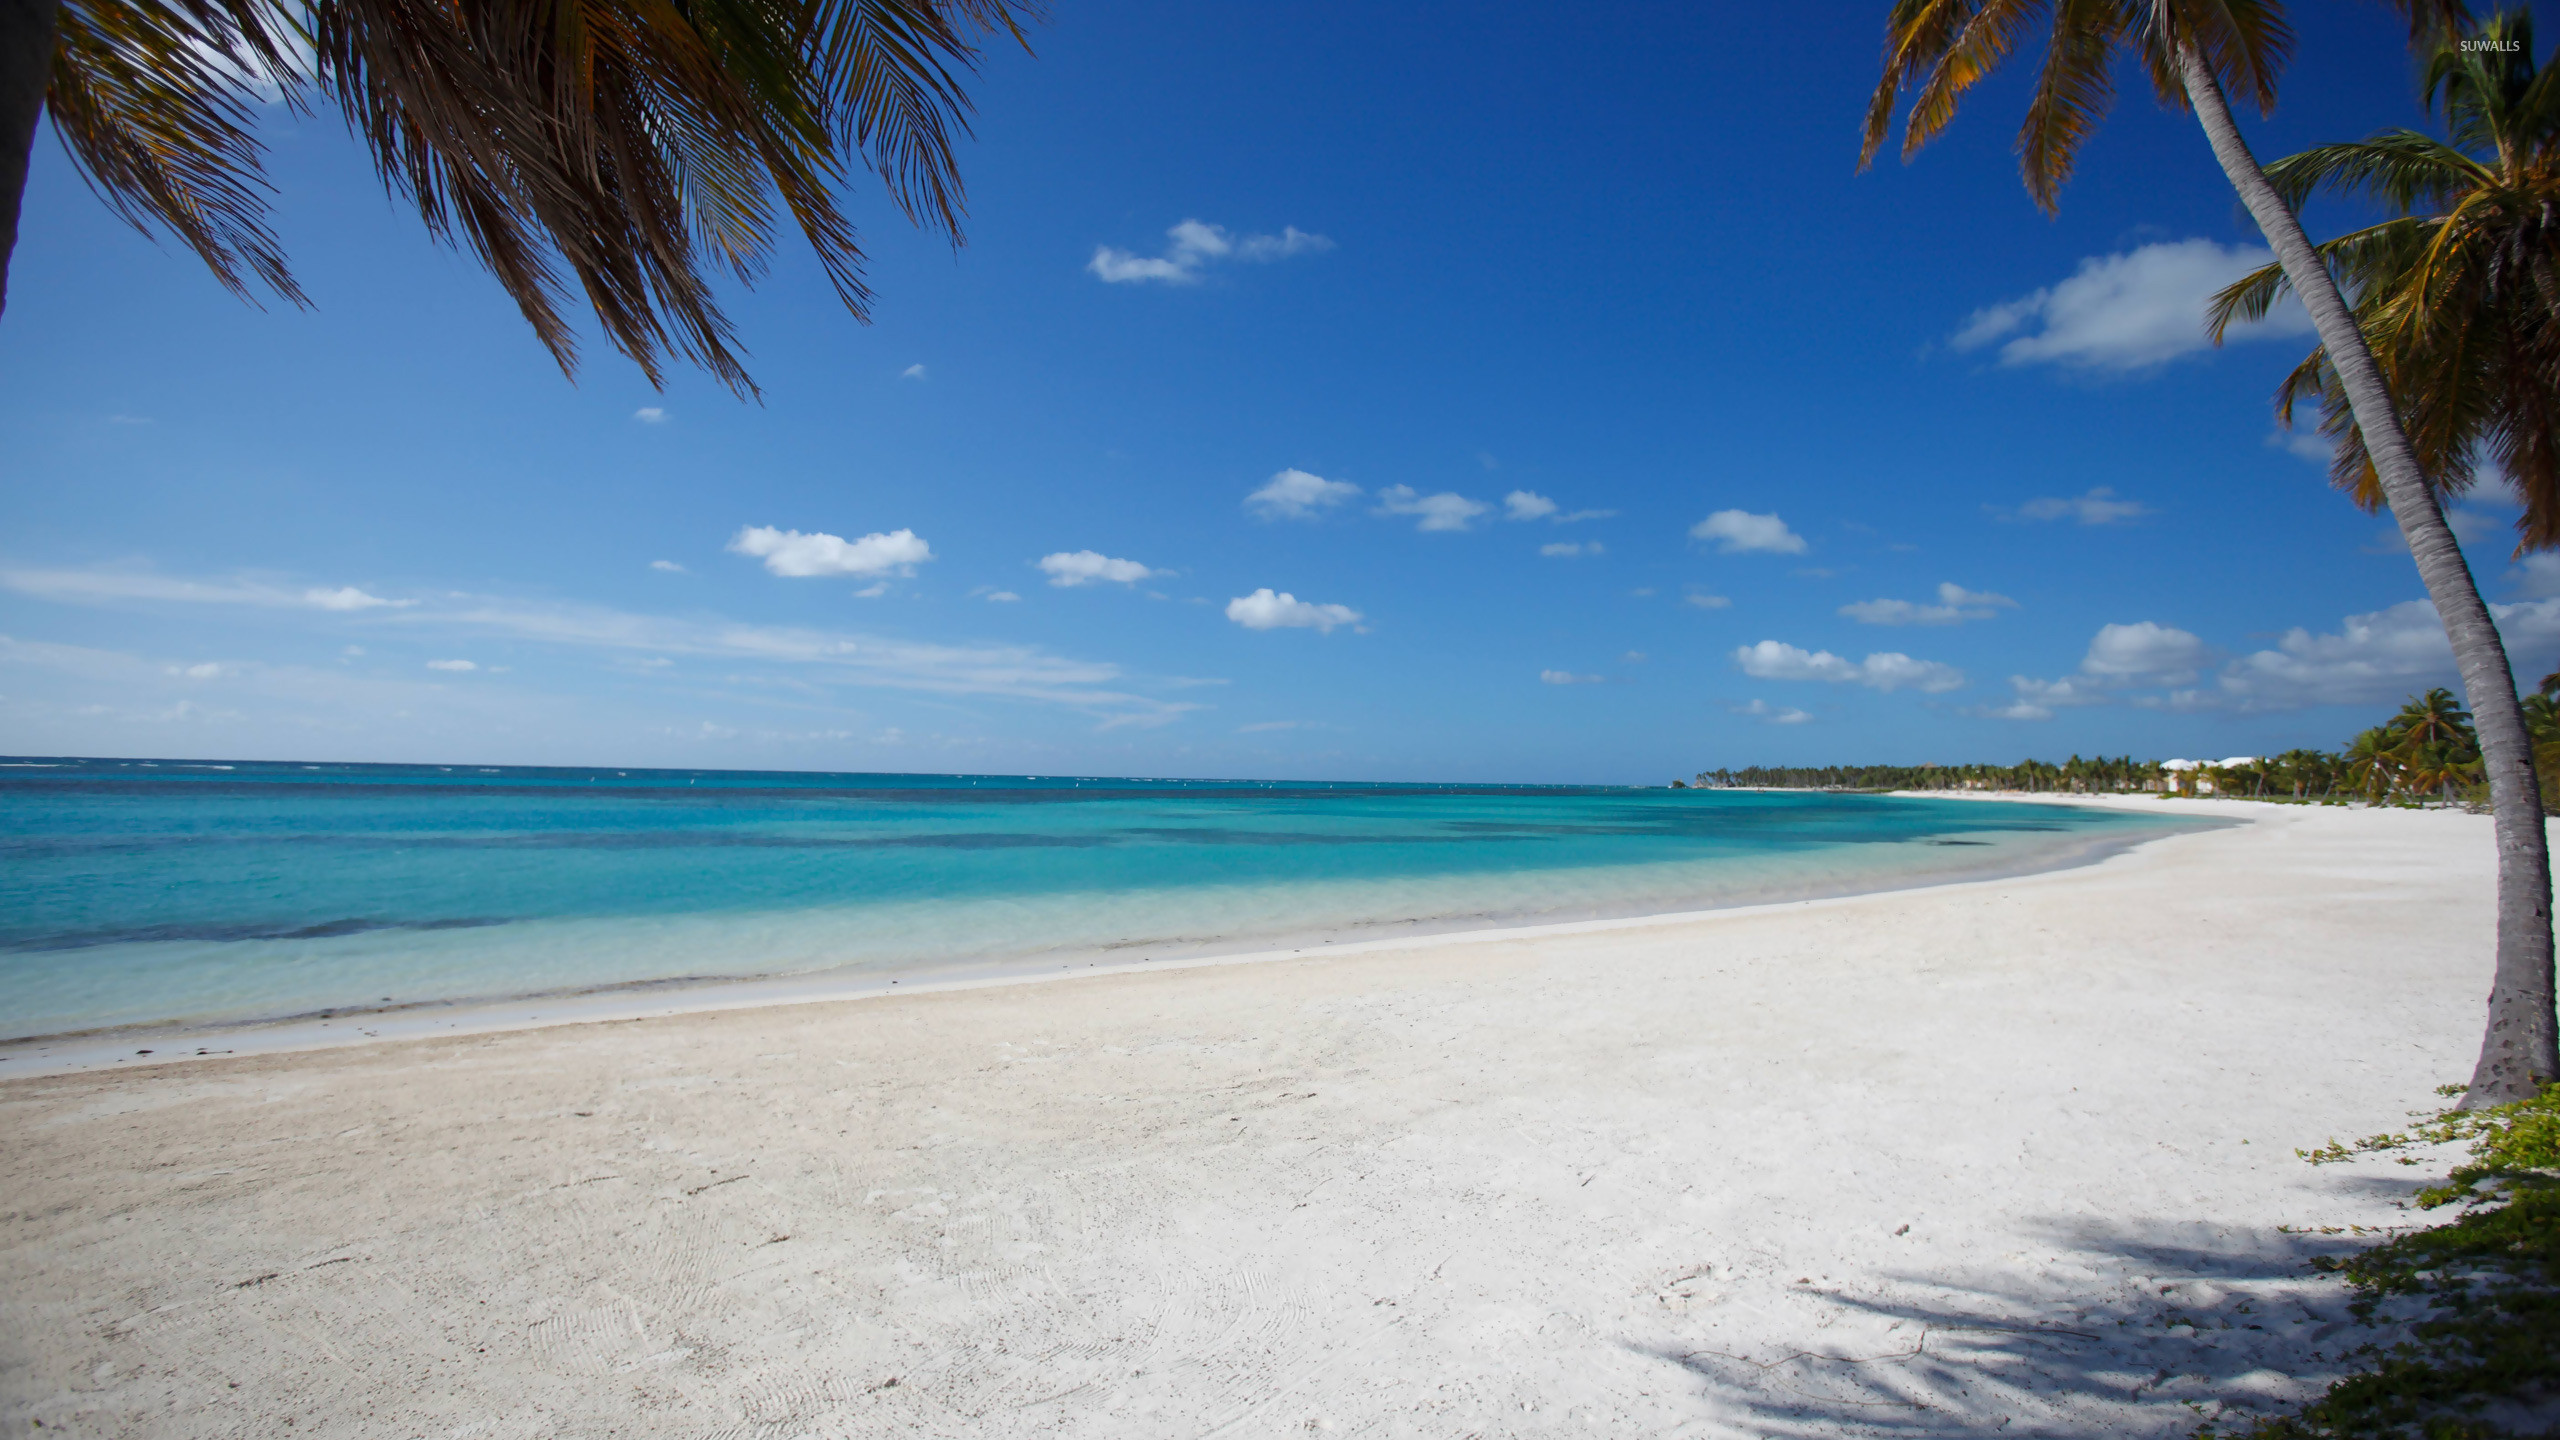 Bavaro, Punta Cana wallpaper – Beach wallpapers – #11666 · dominican  republic …